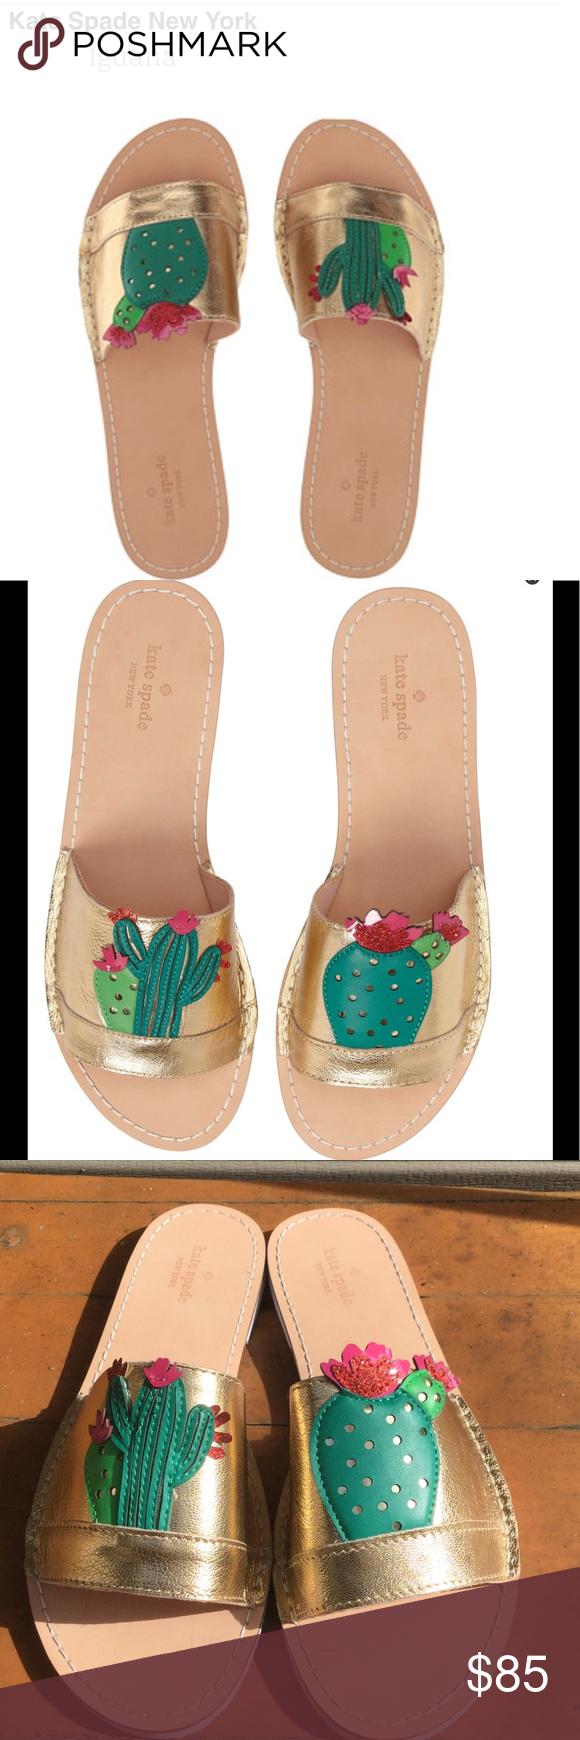 "537cb3133756 NWT Kate Spade Iguana Gold Cactus Slide Sandals NWT Kate Spade ""Iguana""  slides with"